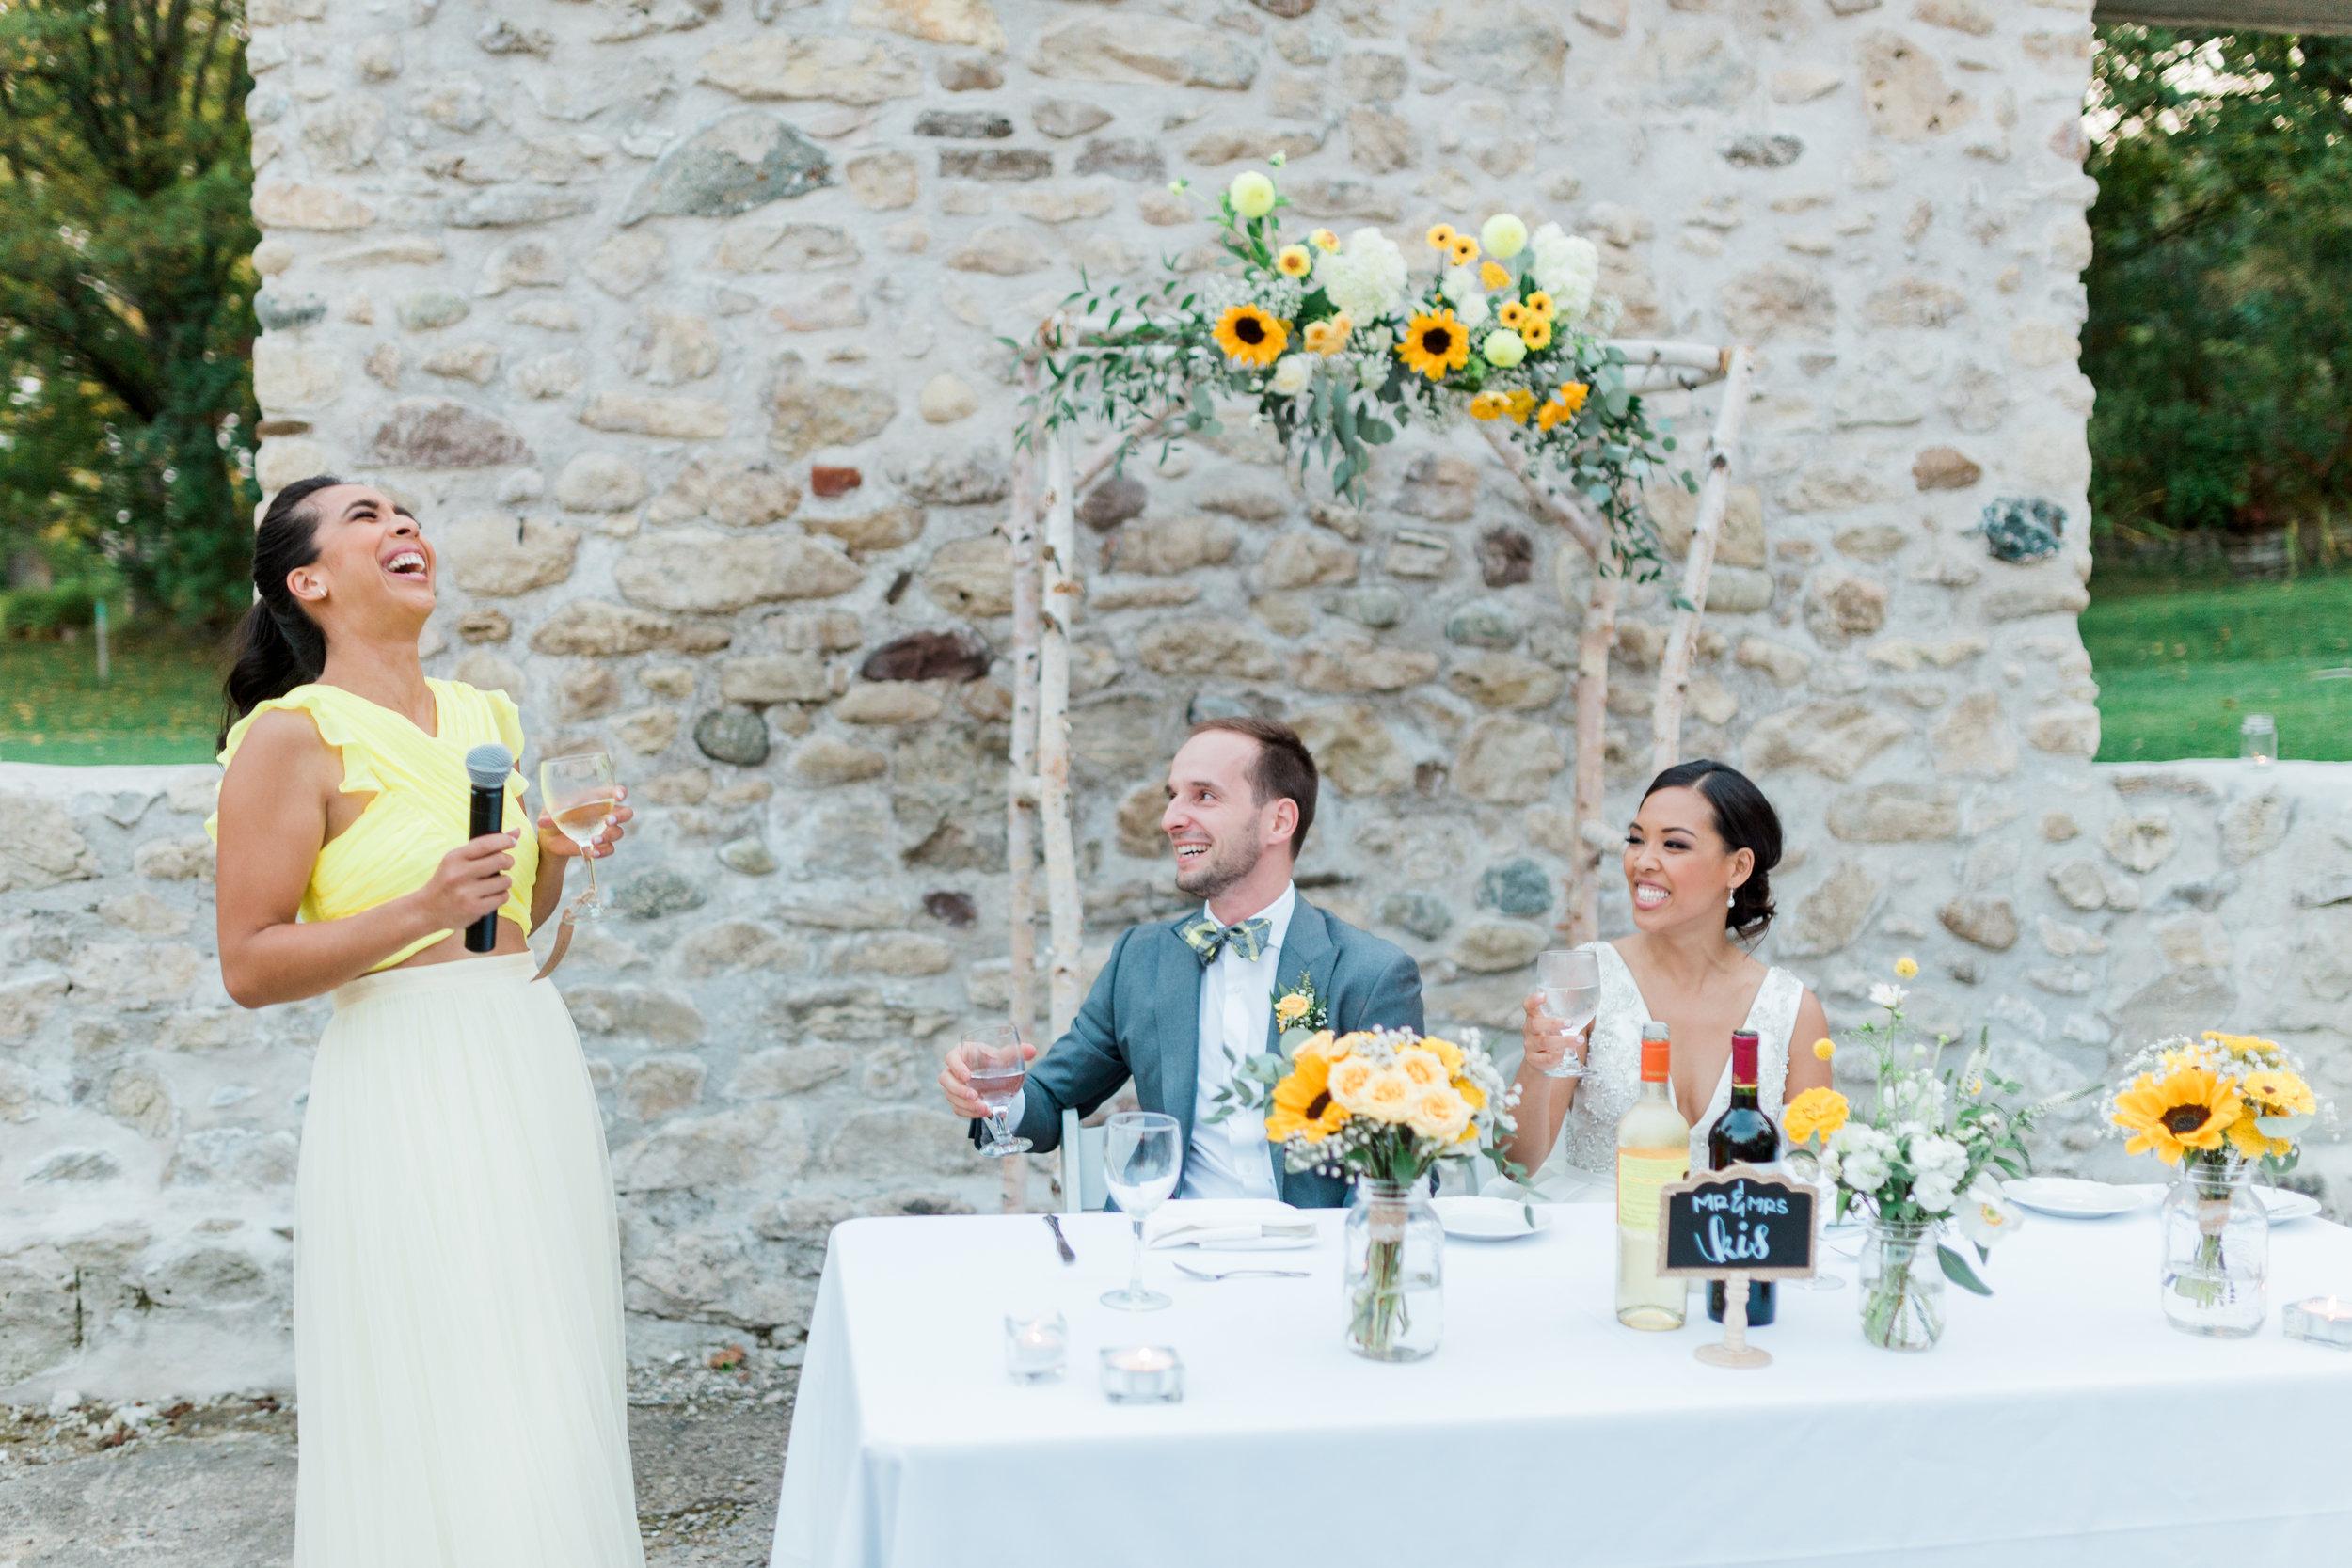 Alton Mills Wedding - Reception-69.jpg